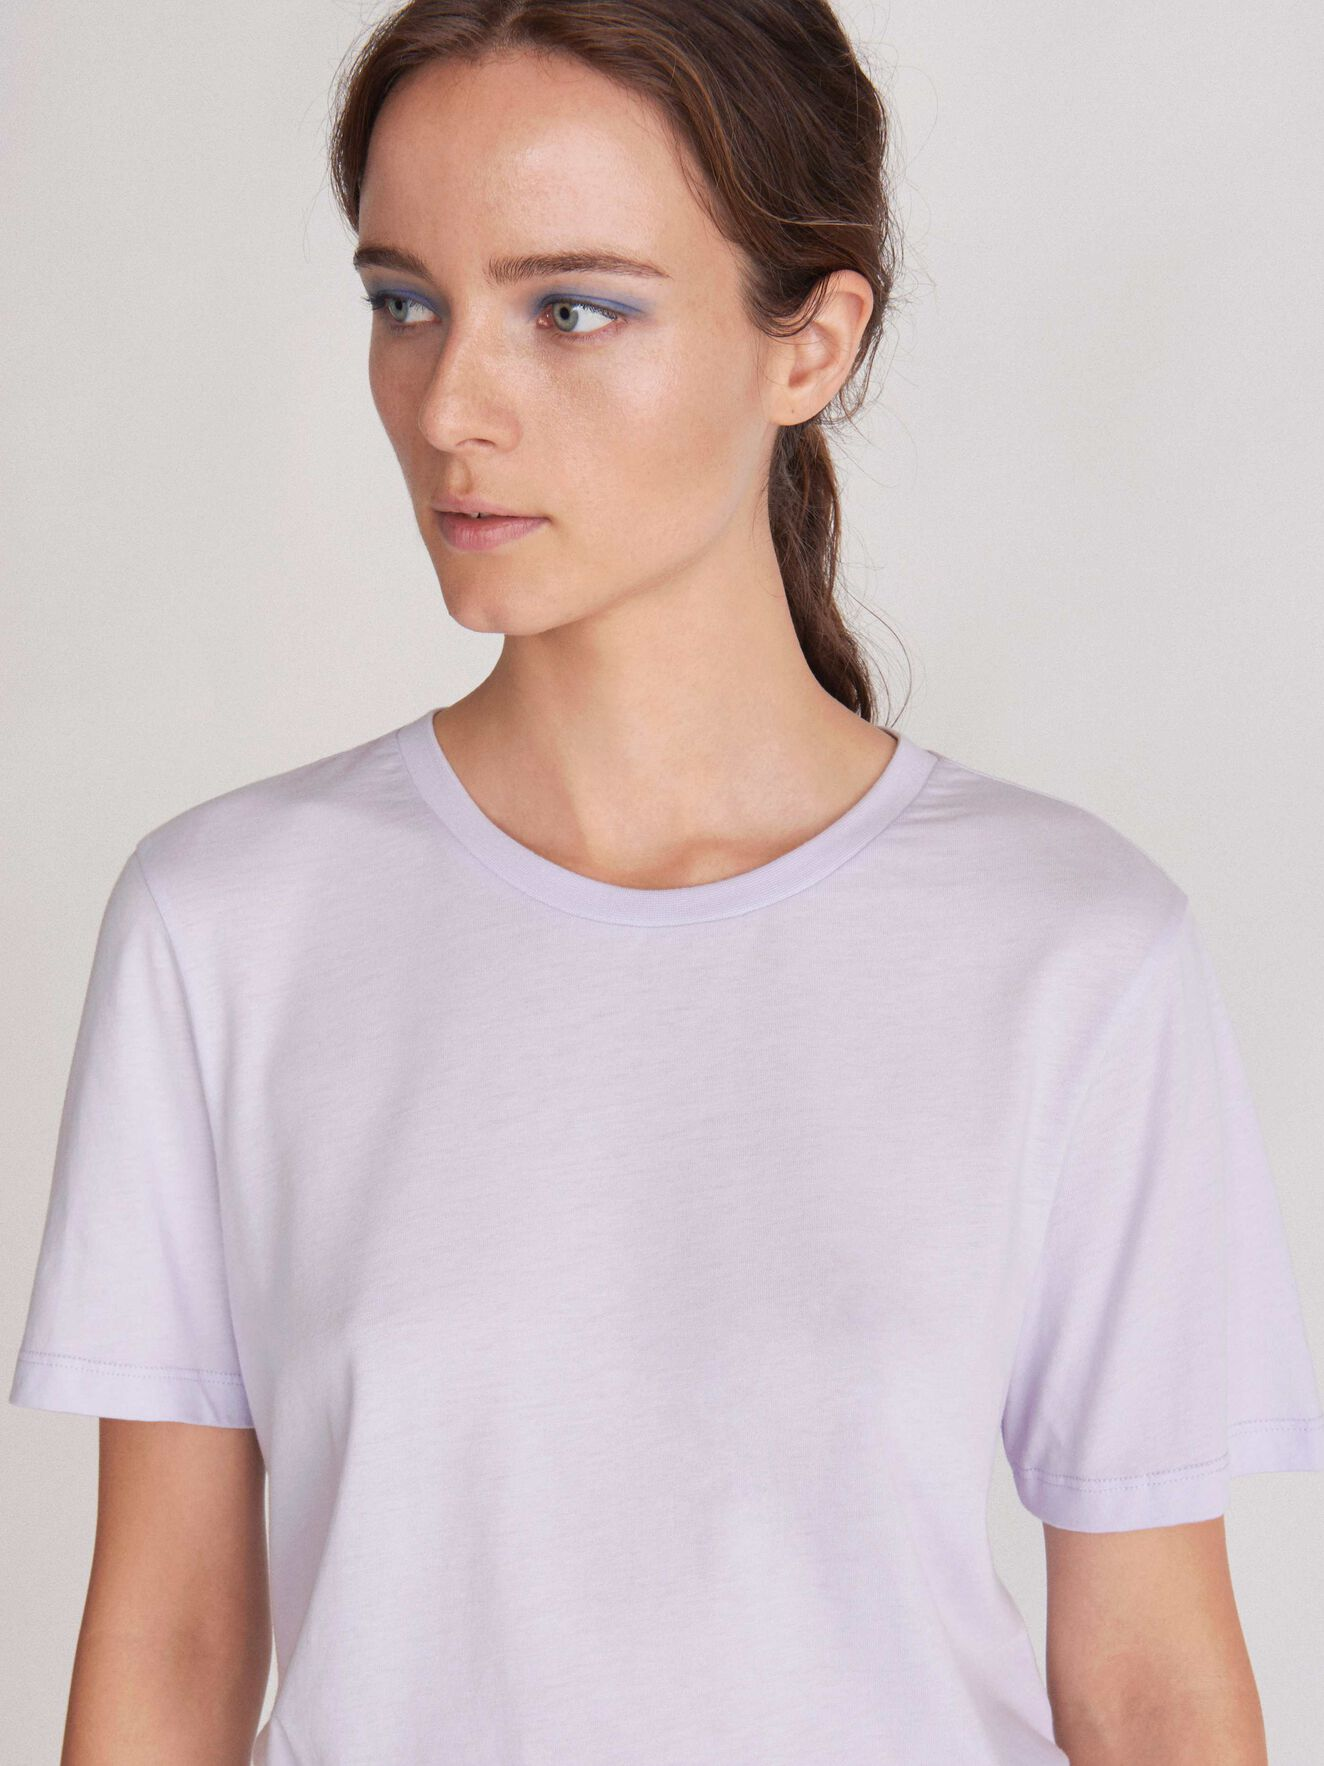 Deira T-Shirt in Soft Lavender from Tiger of Sweden